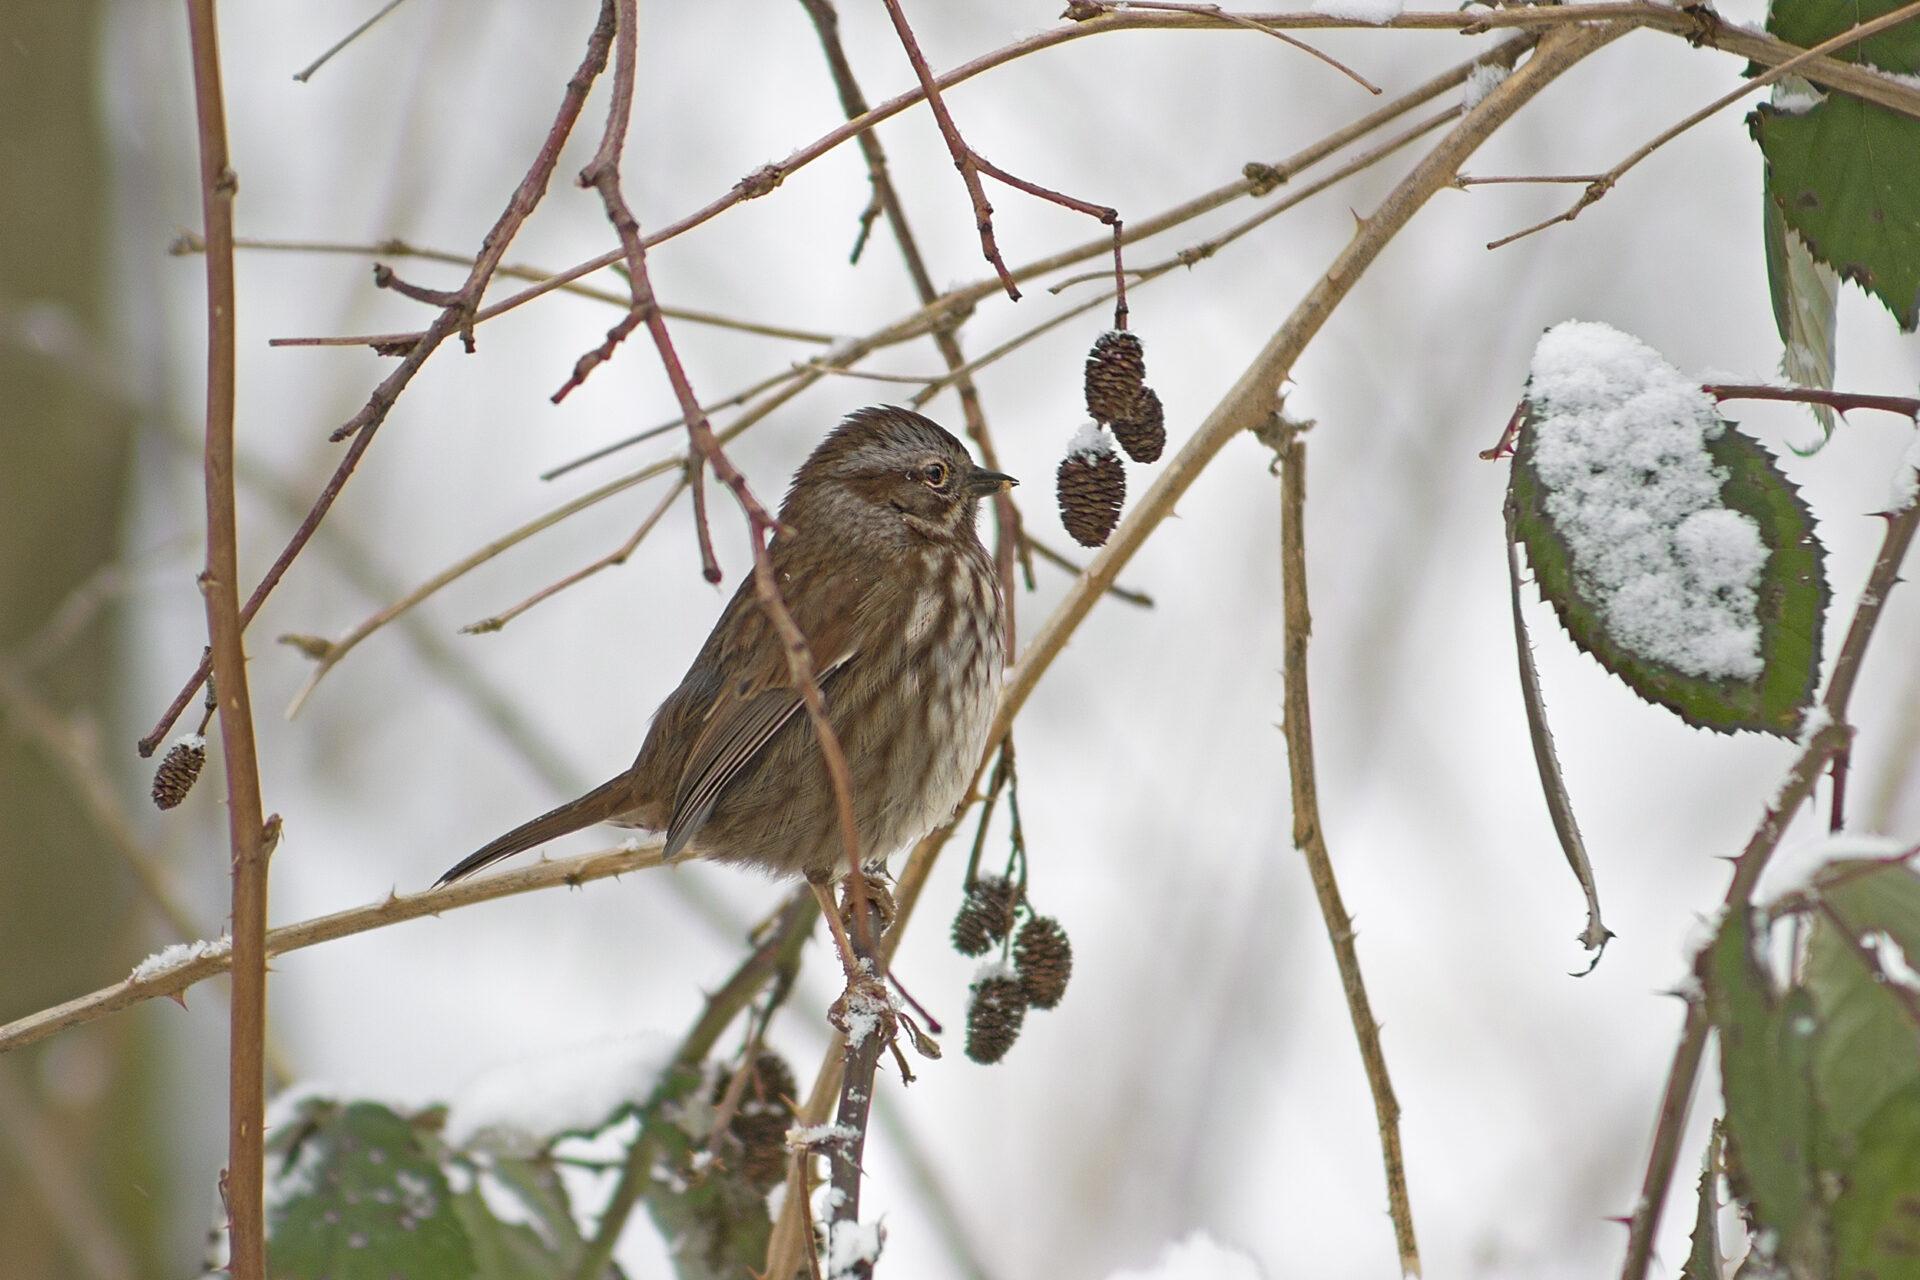 Song Sparrow, February 13, 2019